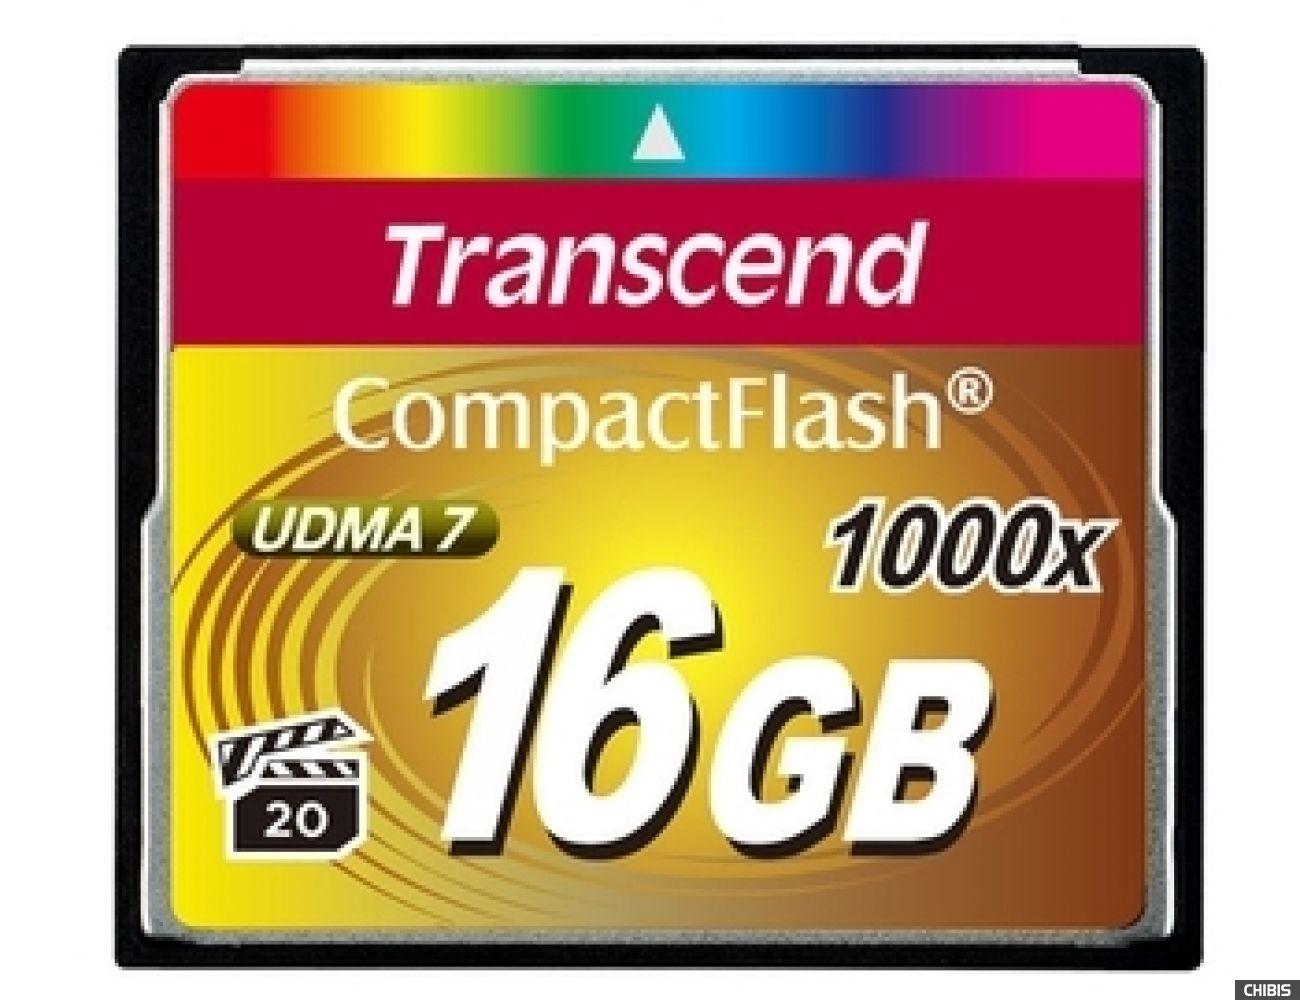 Карта памяти Transcend Compact Flash 1000x 16Gb